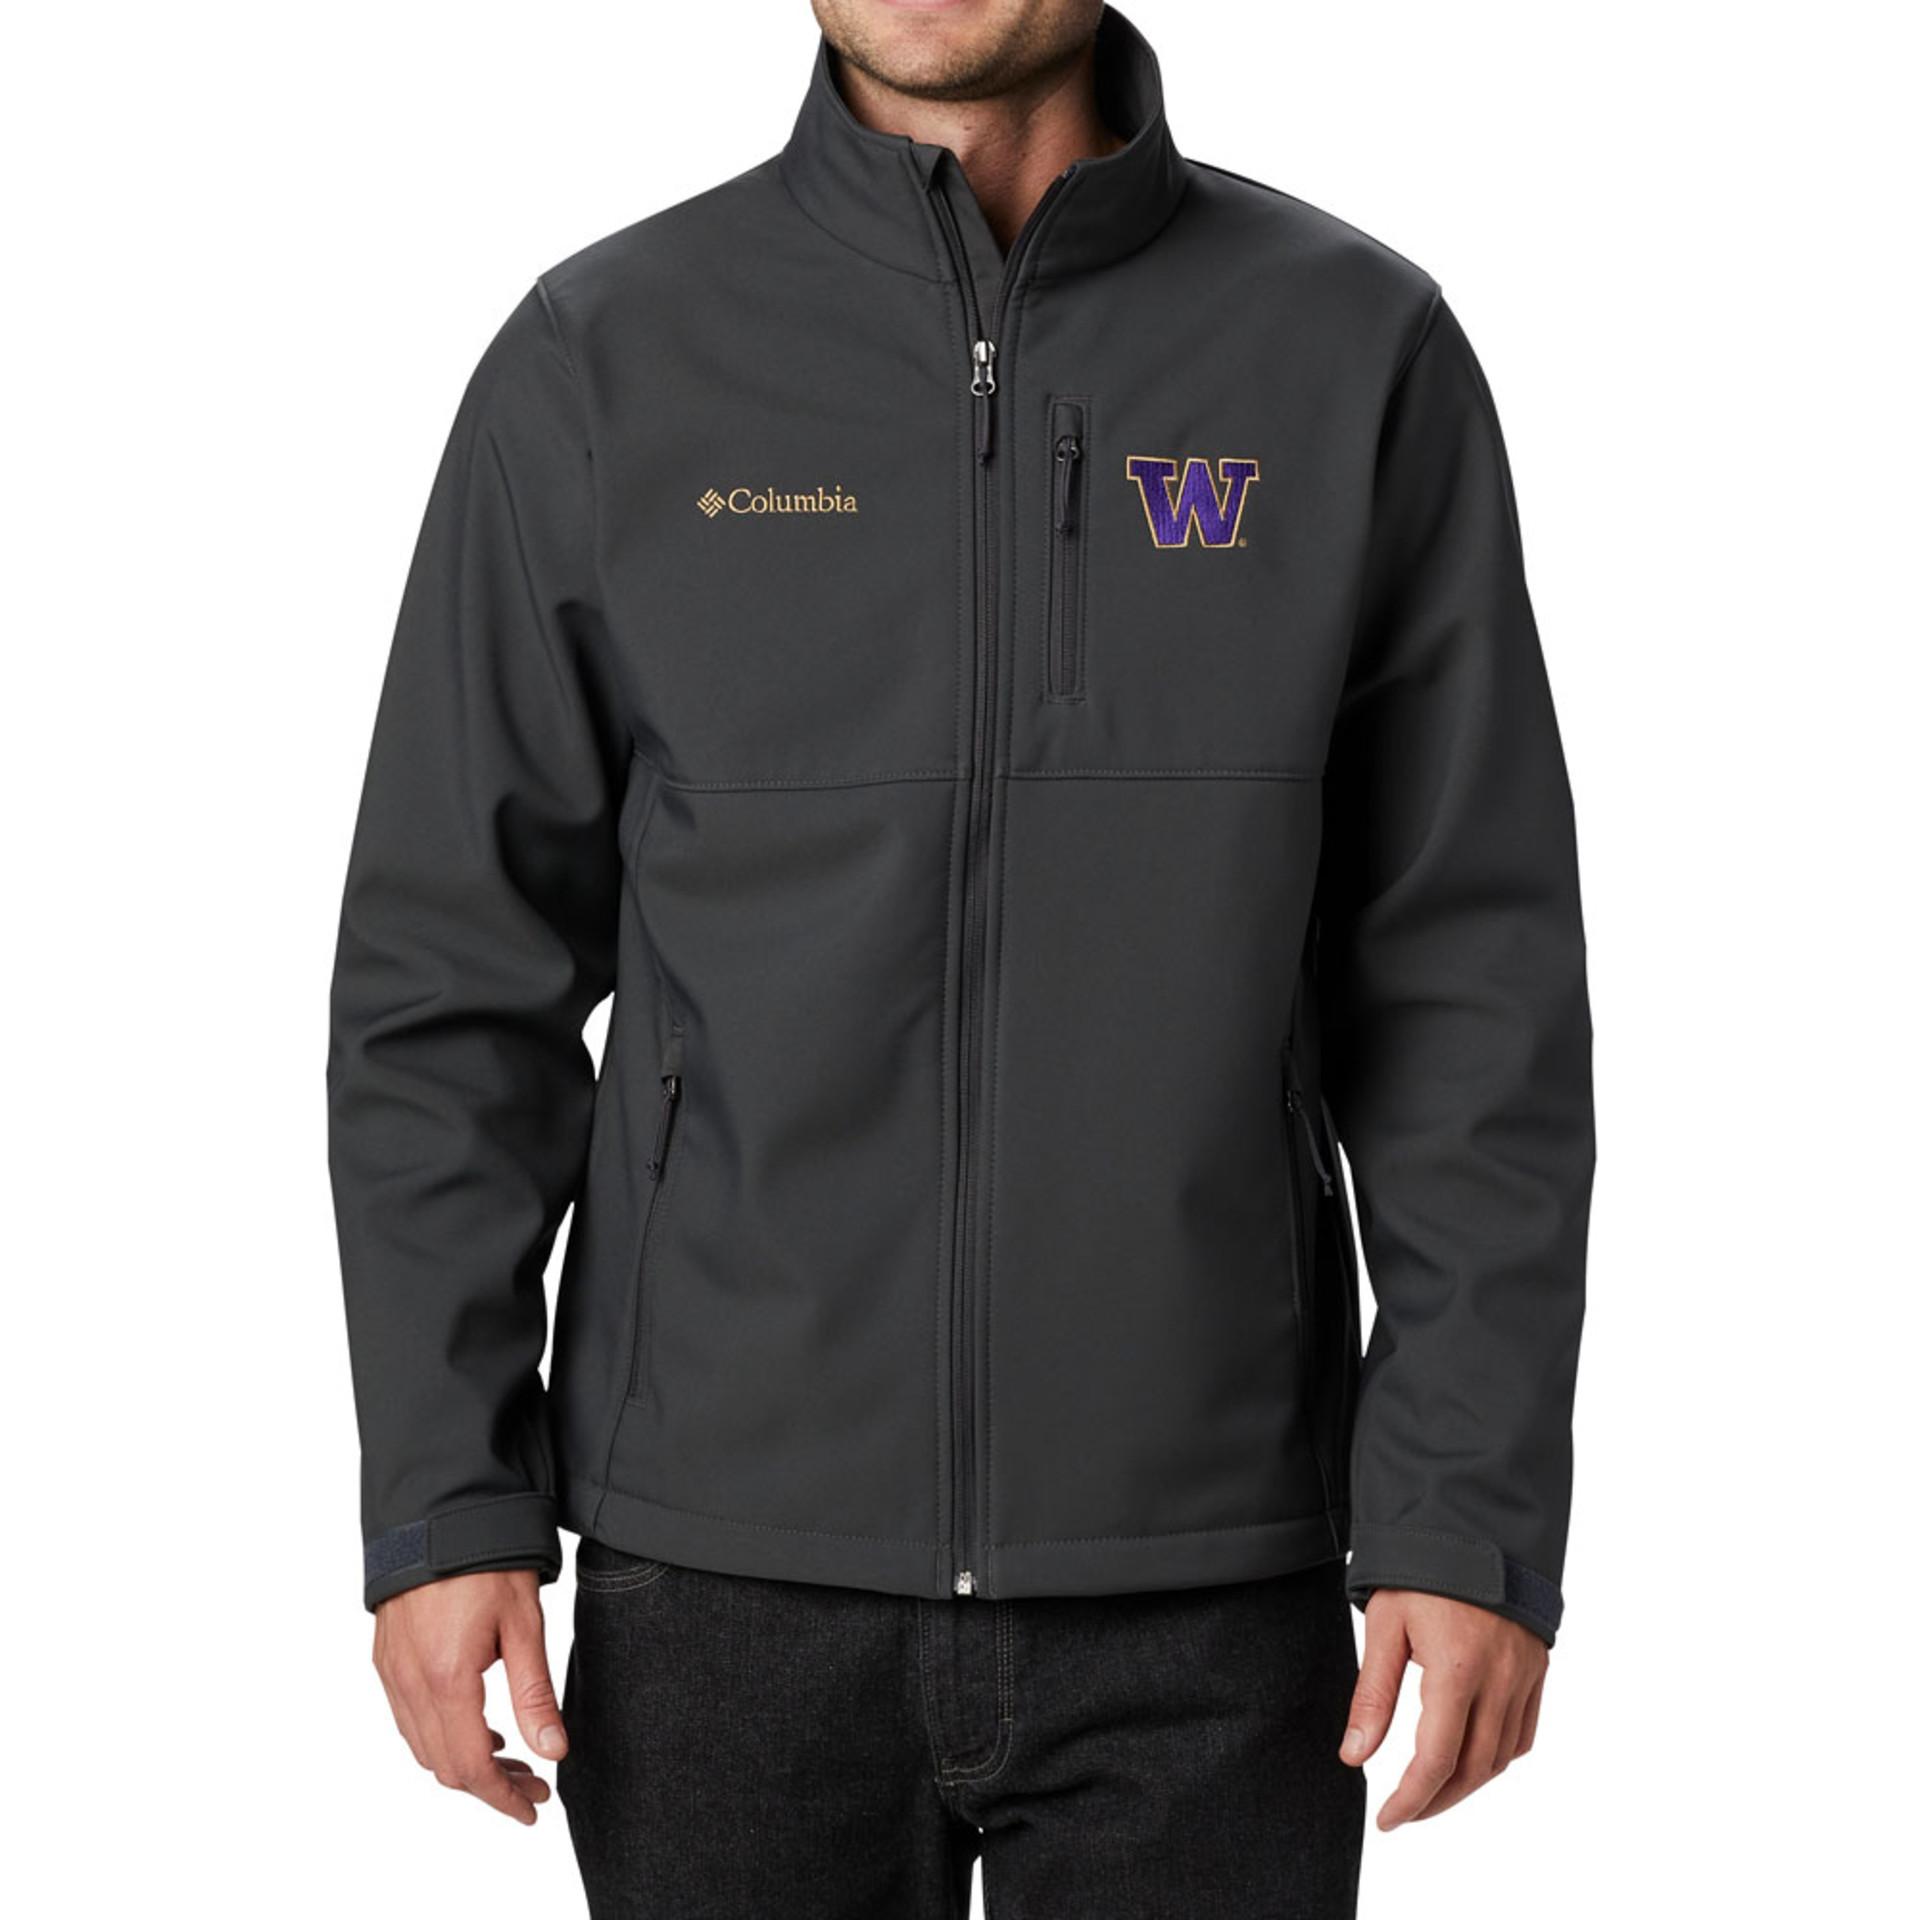 Columbia Men's W Ascender Softshell Jacket – Black